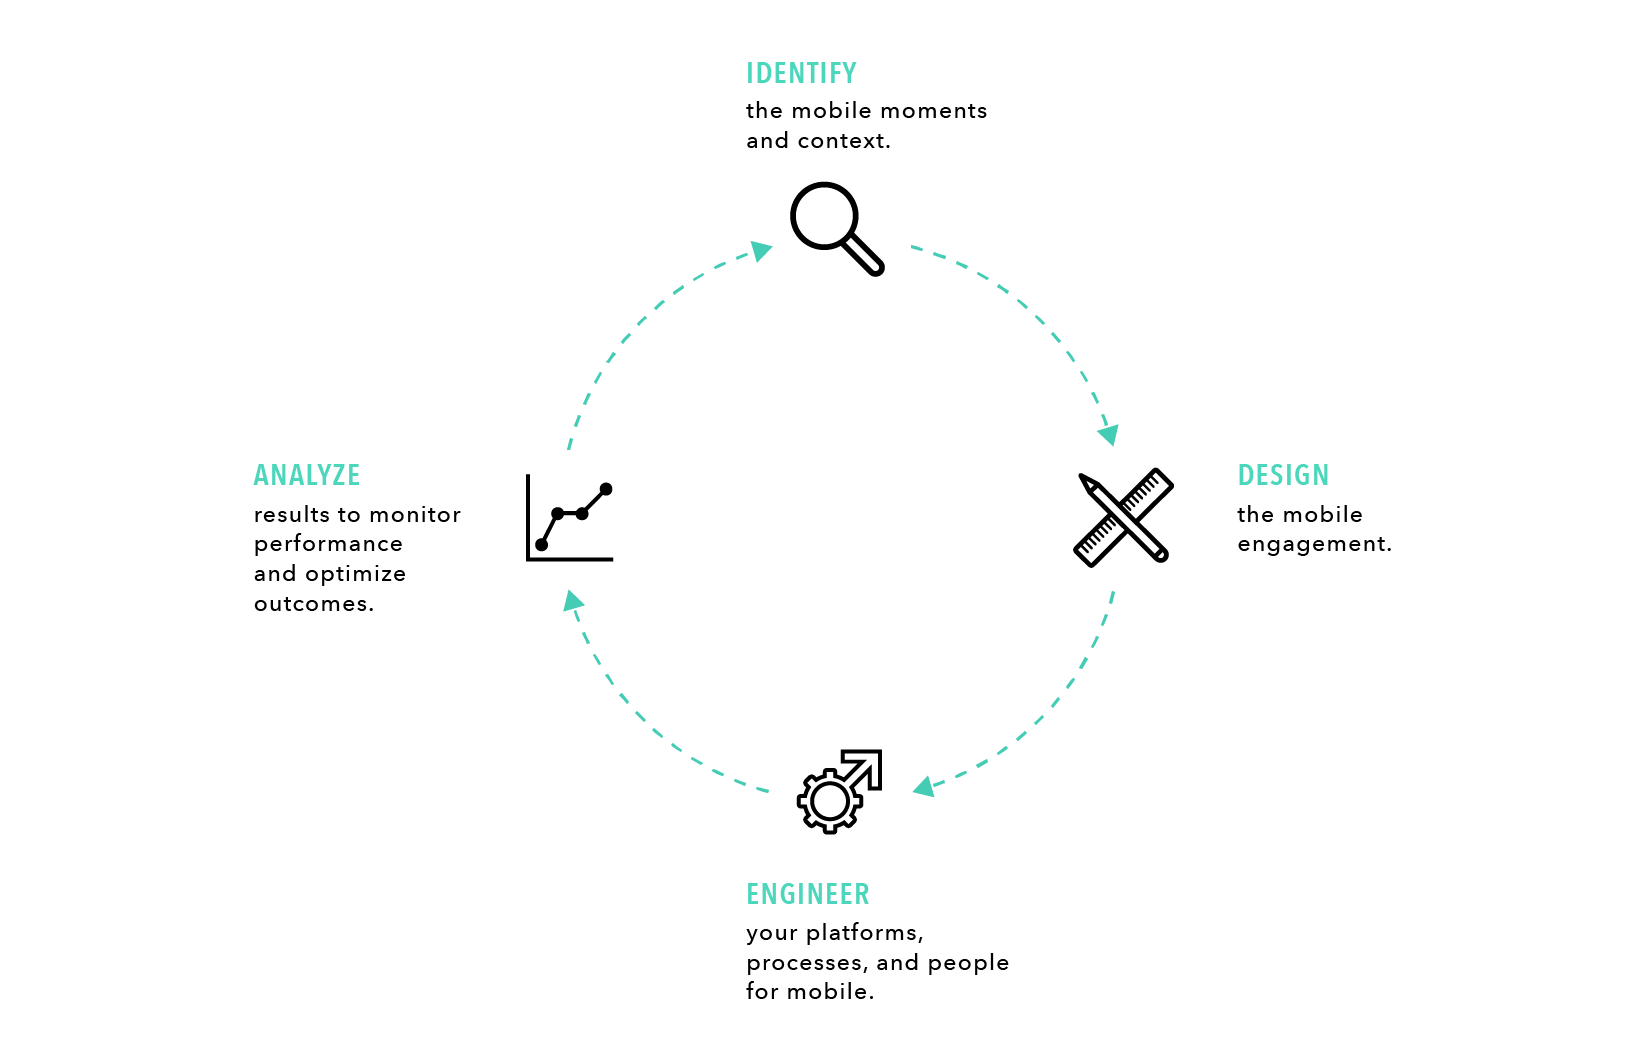 IDEA framework for mobile moments